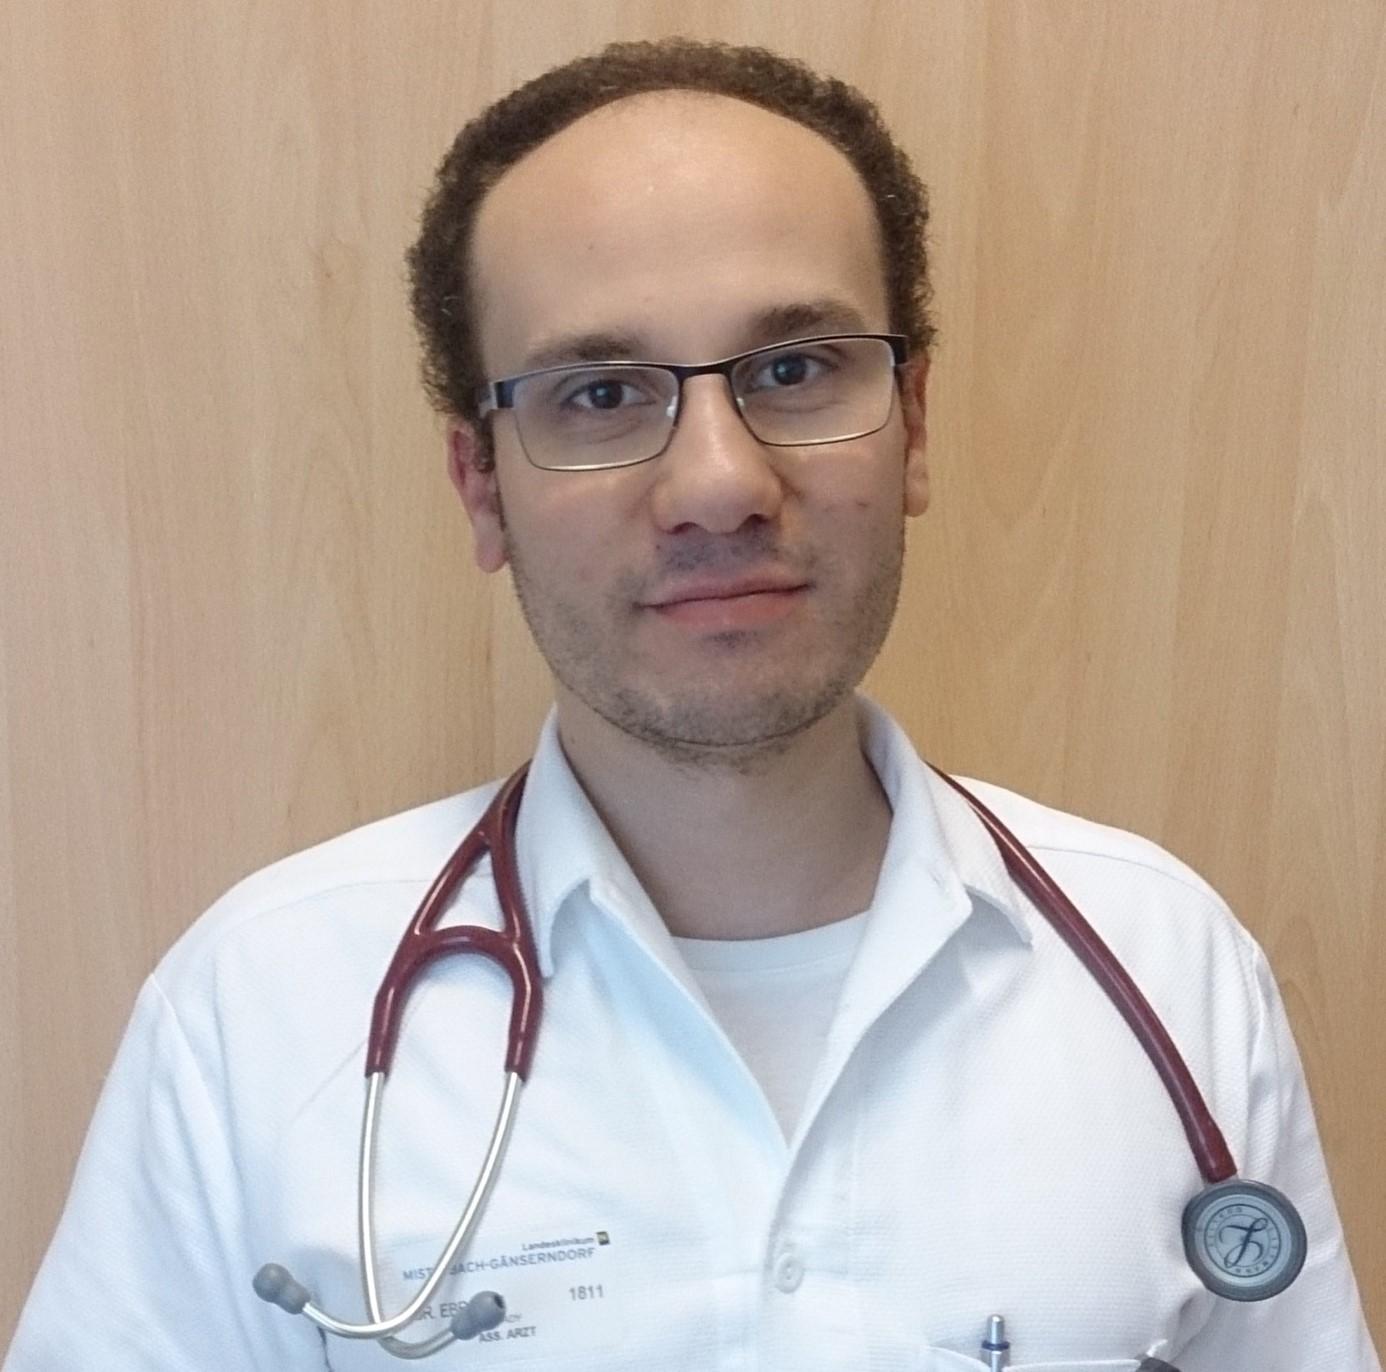 Dr. Marion Kara - Facharztzentrum Hagenbrunn